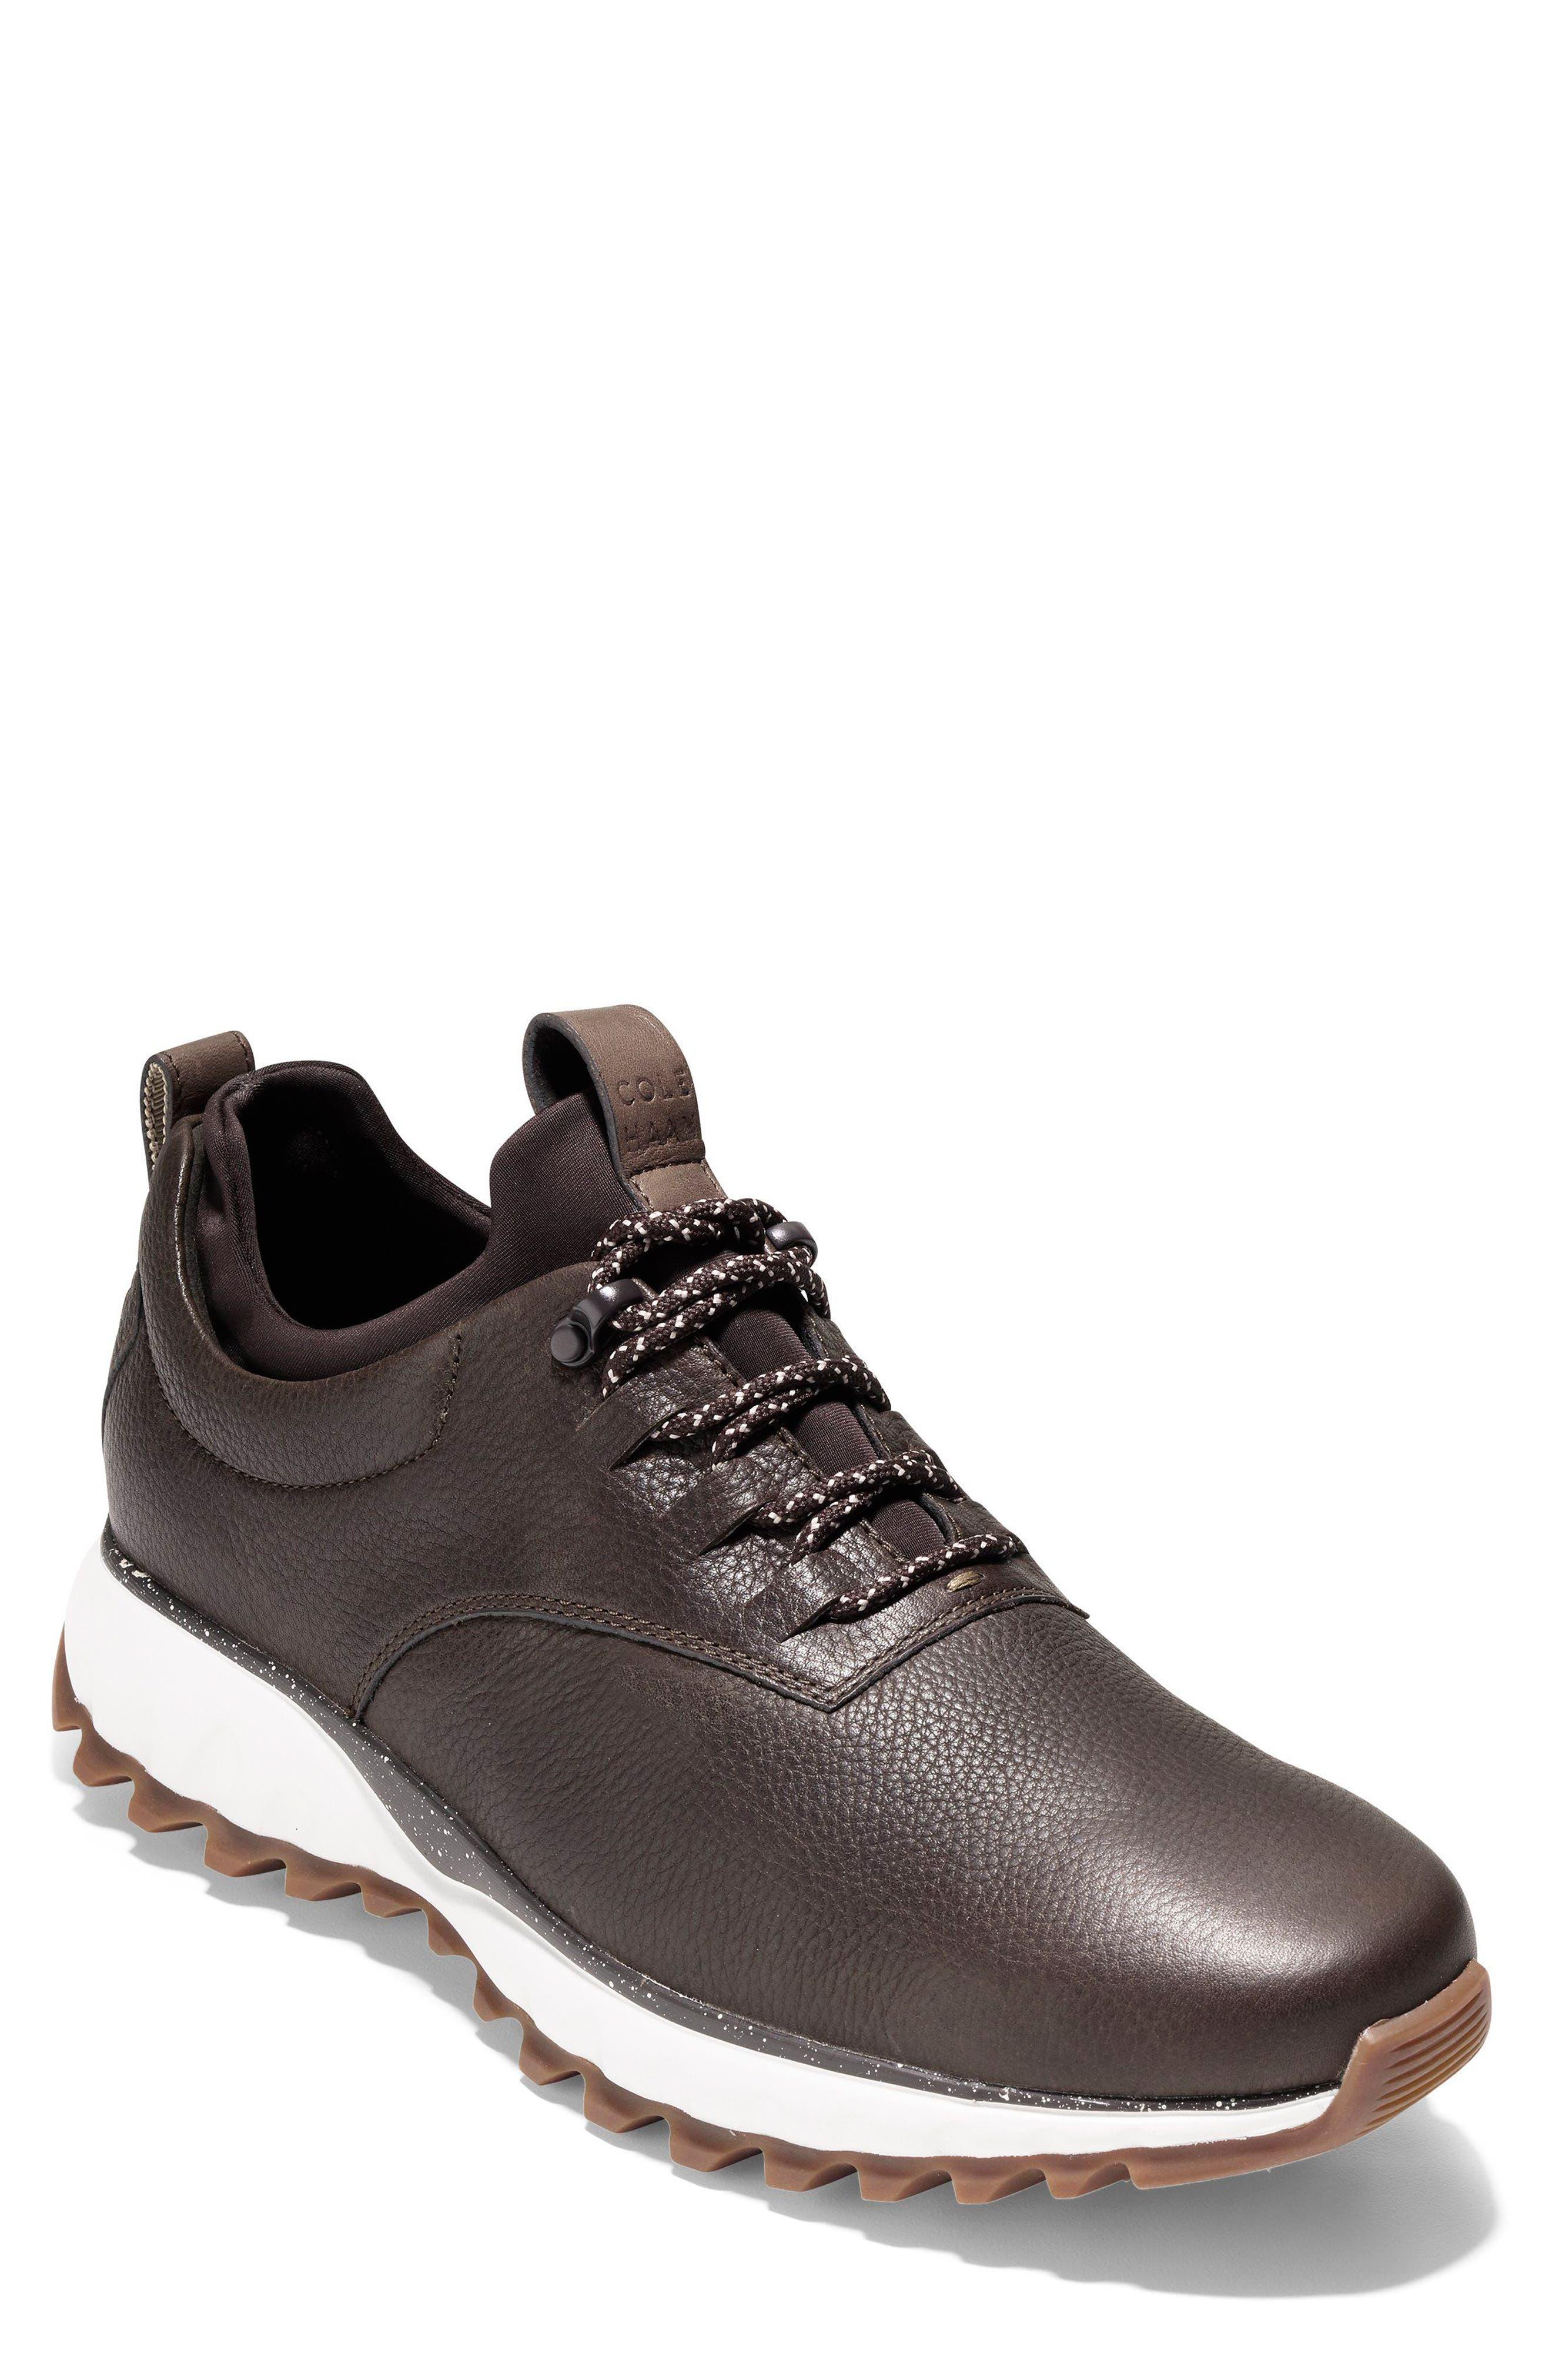 GrandExpløre All Terrain Waterproof Sneaker,                             Main thumbnail 1, color,                             200